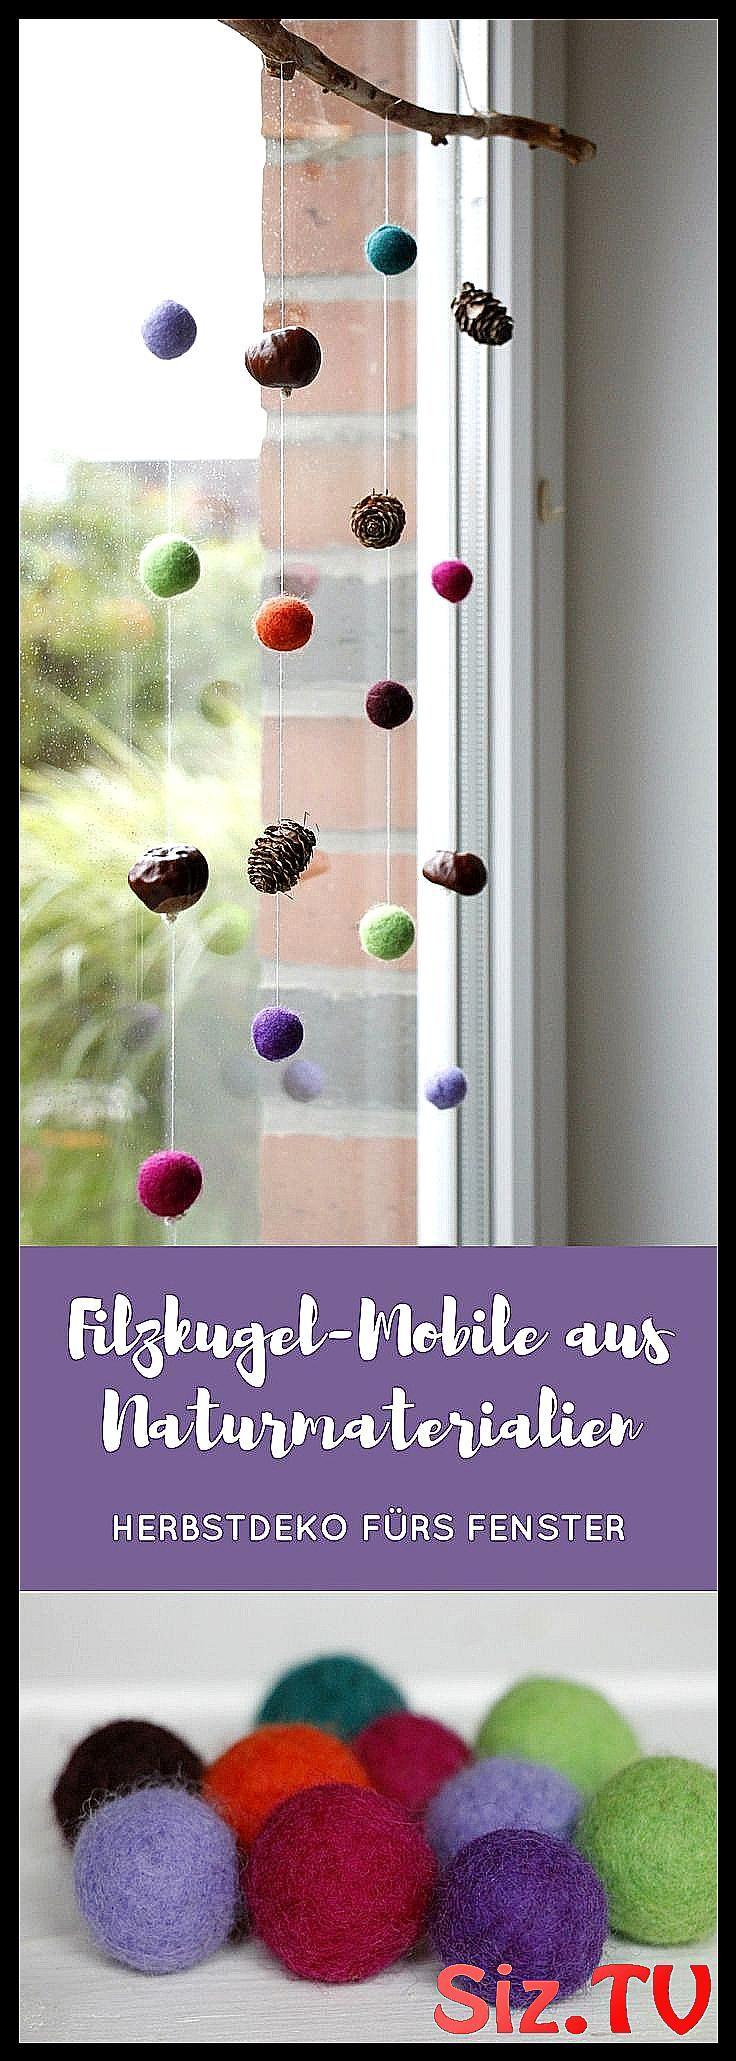 #herbstfensterdekokinder